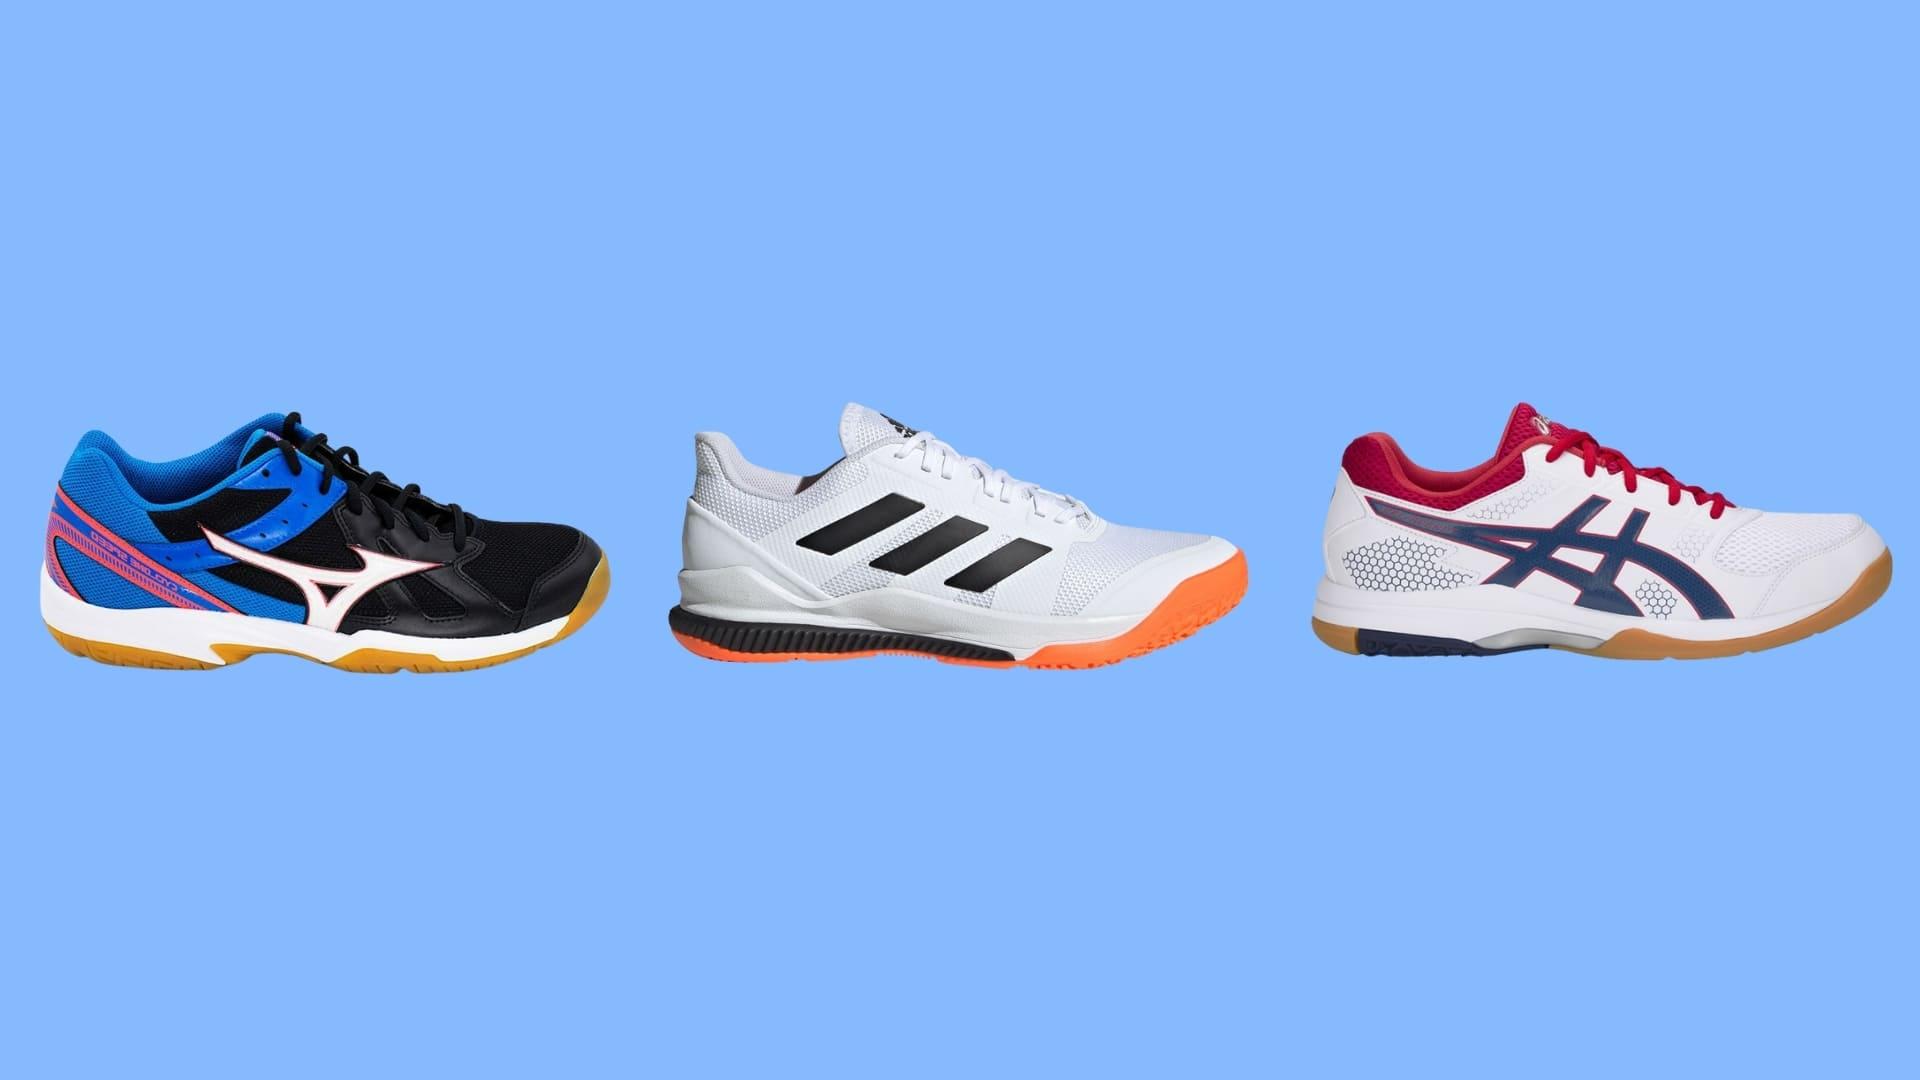 meilleures-chaussures-de-sport-dinterieur